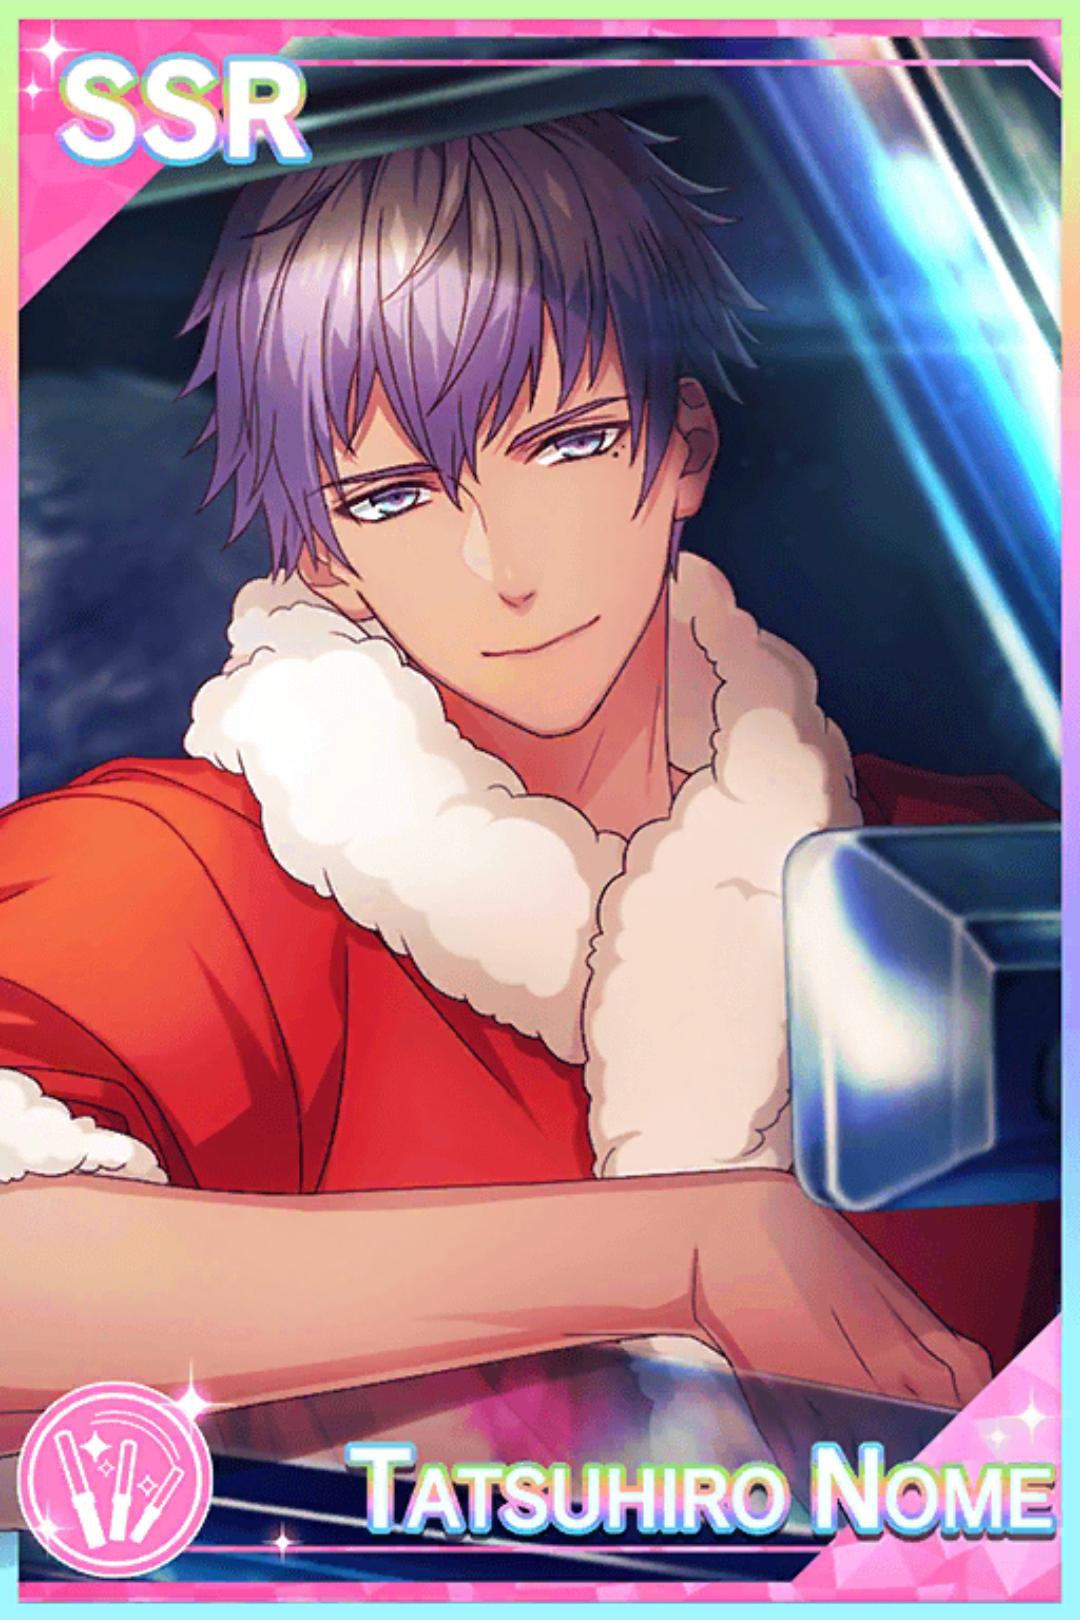 【Chivalrous Santa】Nome Tatsuhiro